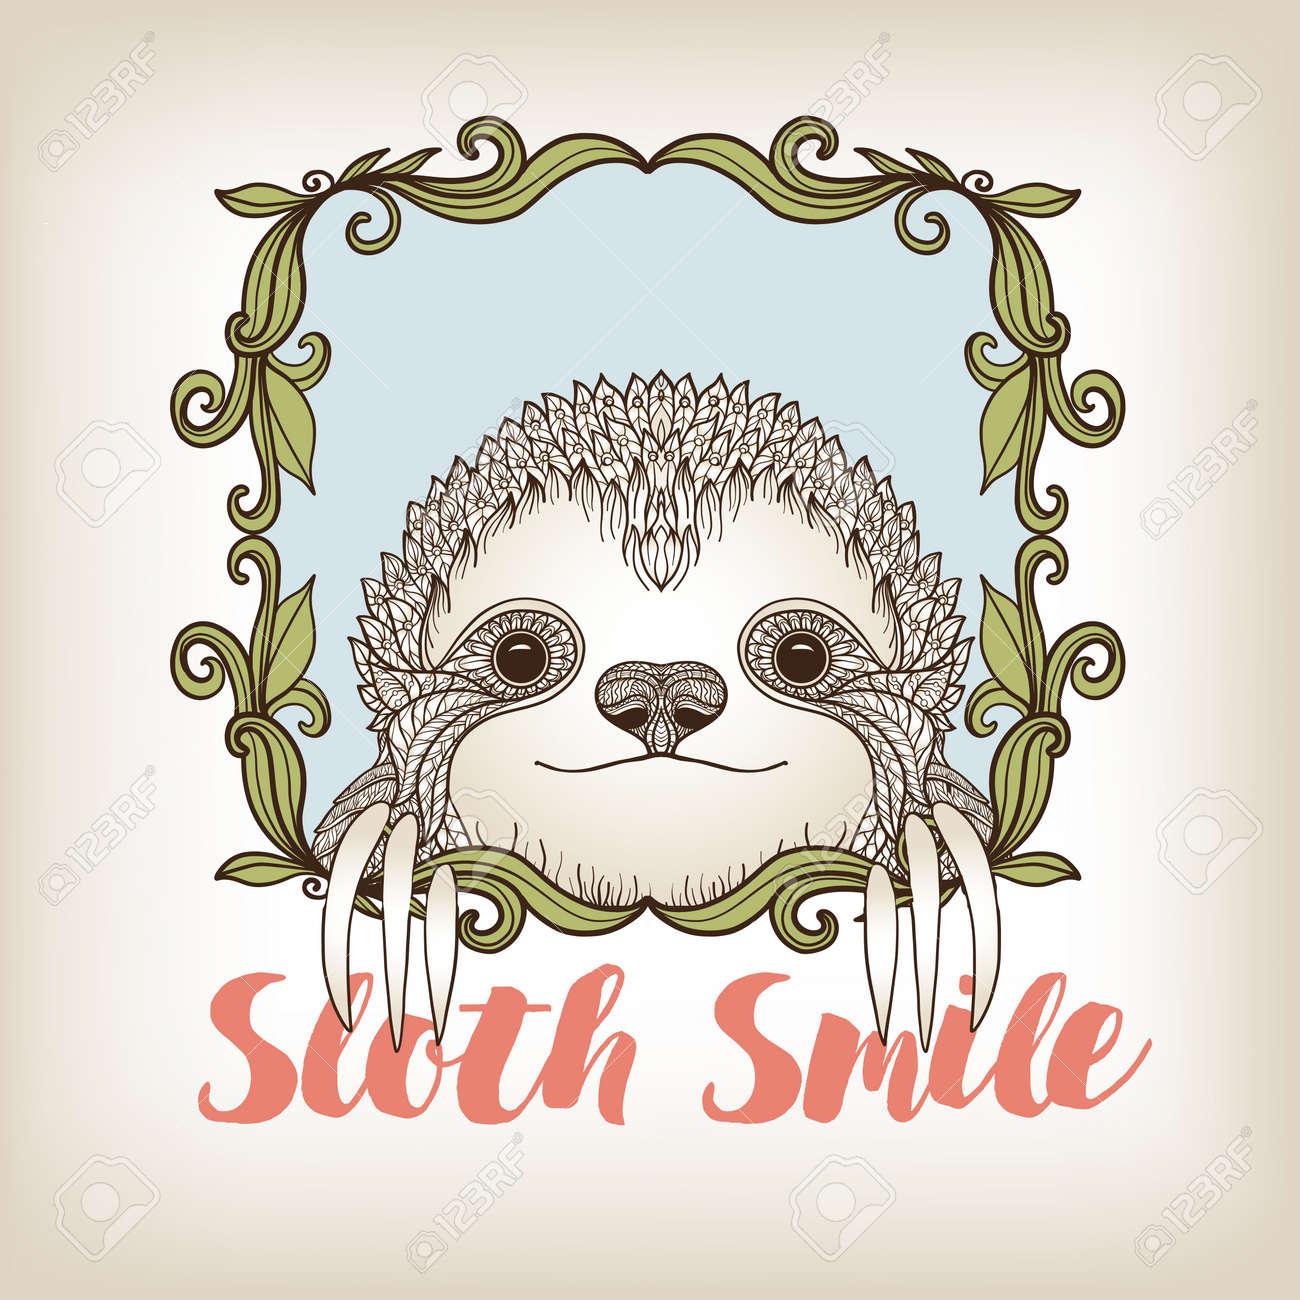 Sloth In Dekorativen Rahmen. Vektor-Illustration. Skizze Für ...